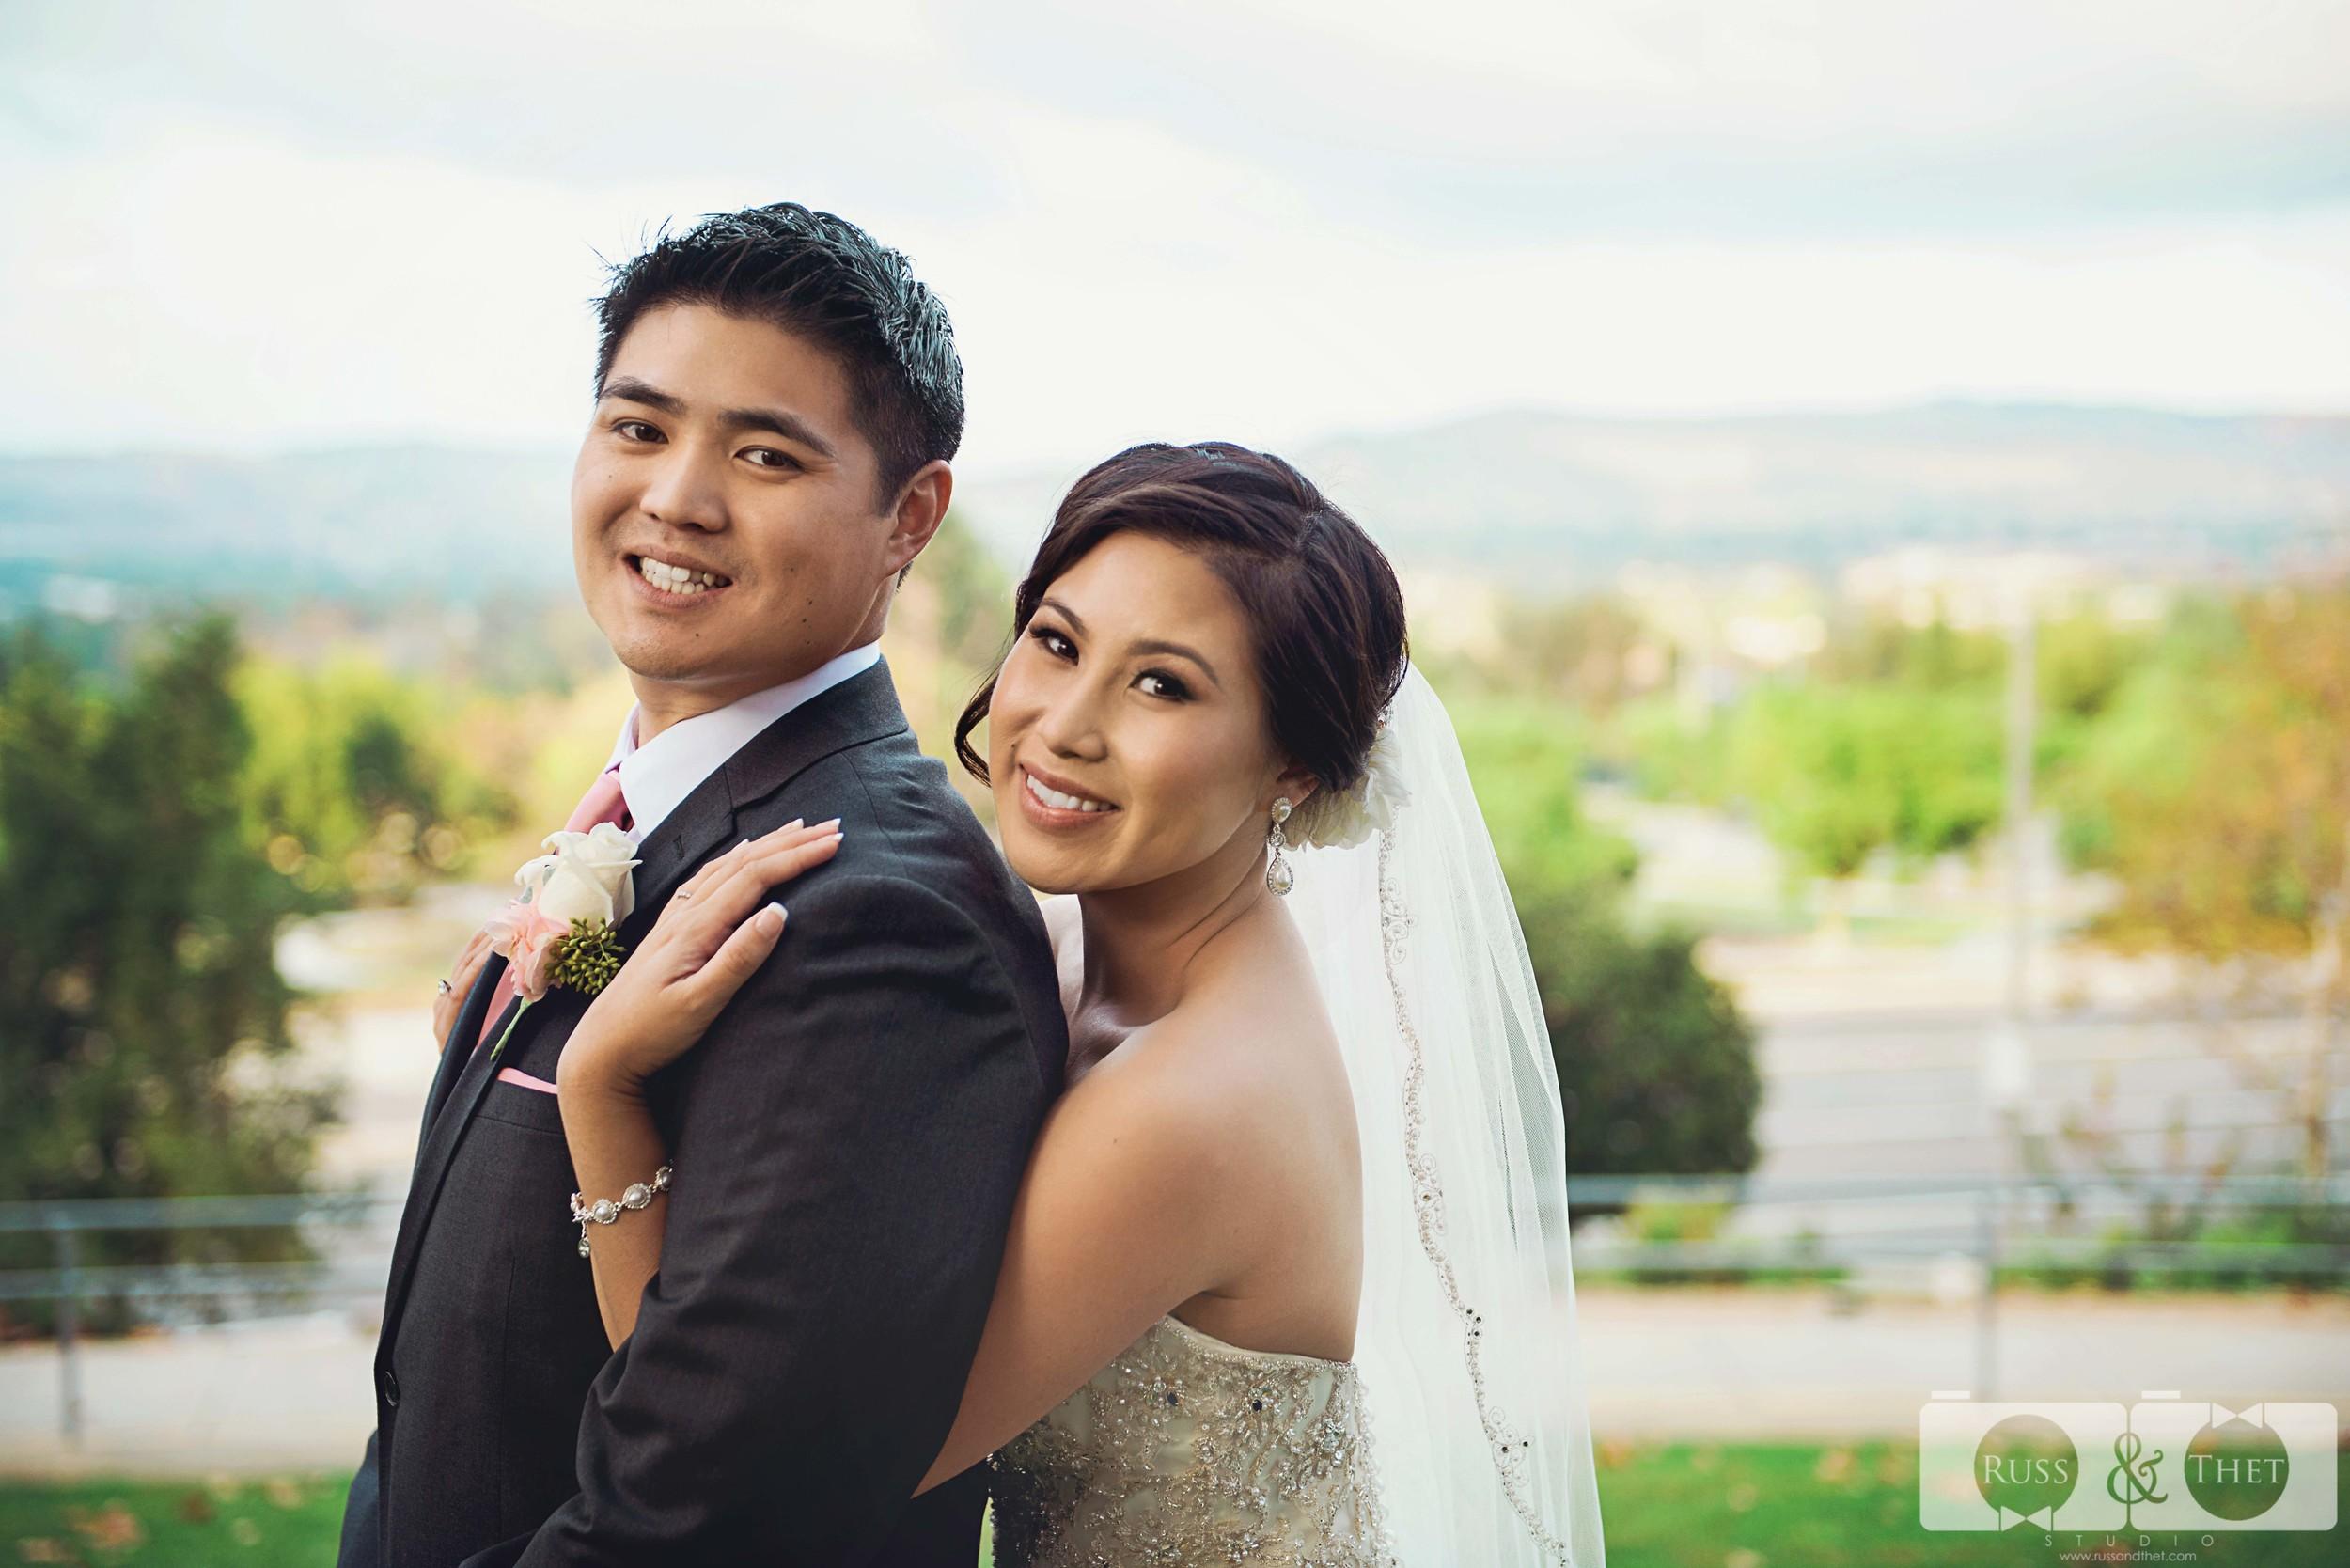 summit-house-fullerton-wedding-photographer-104.JPG